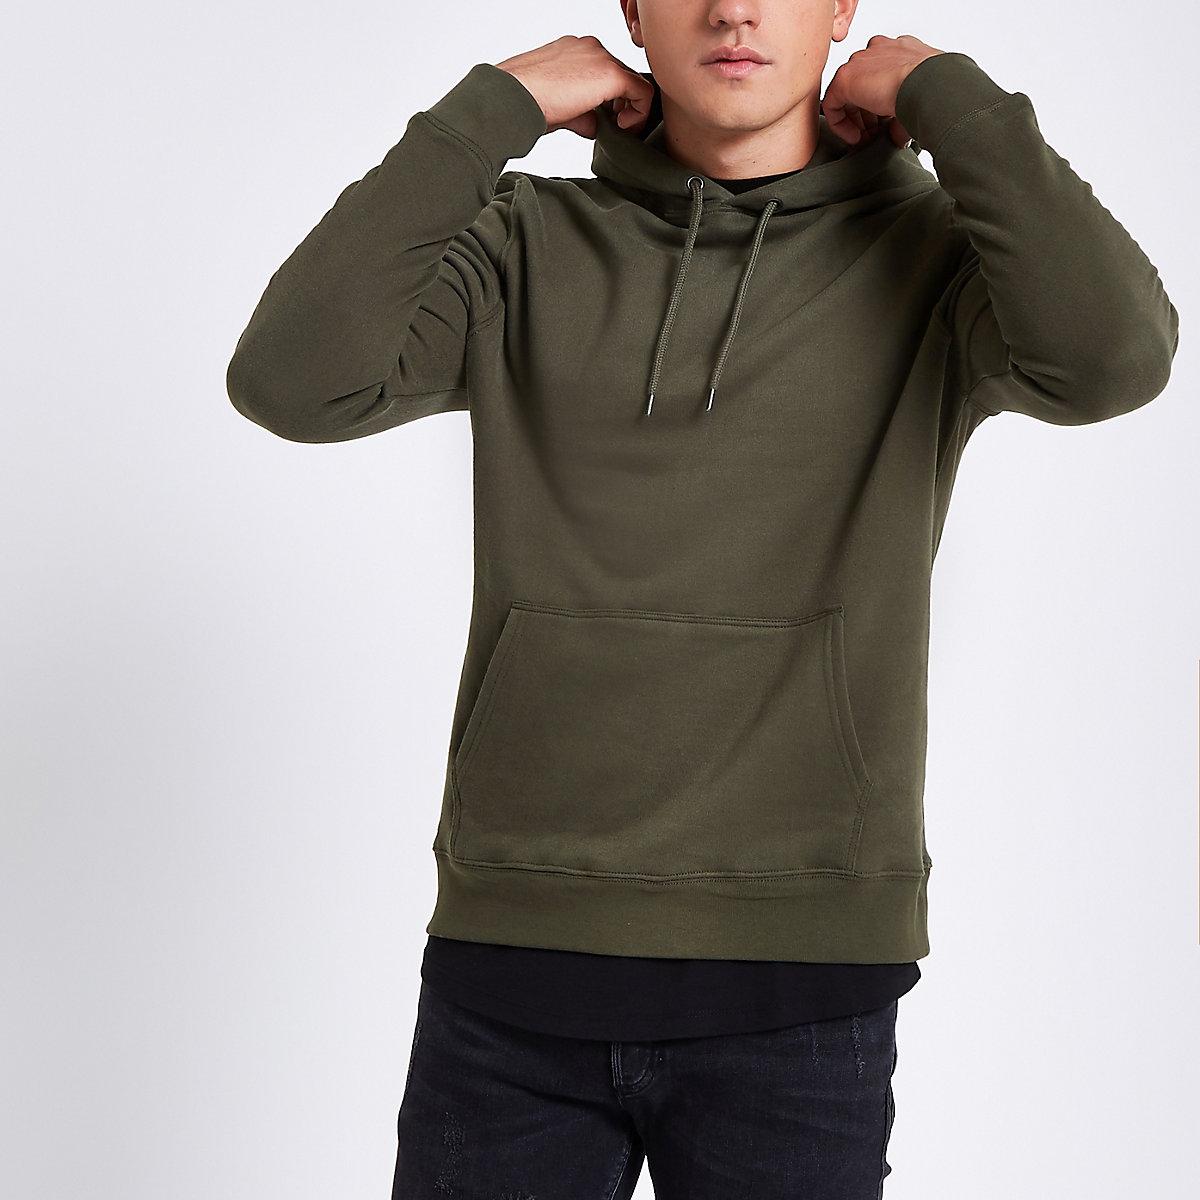 Khaki long sleeve hoodie